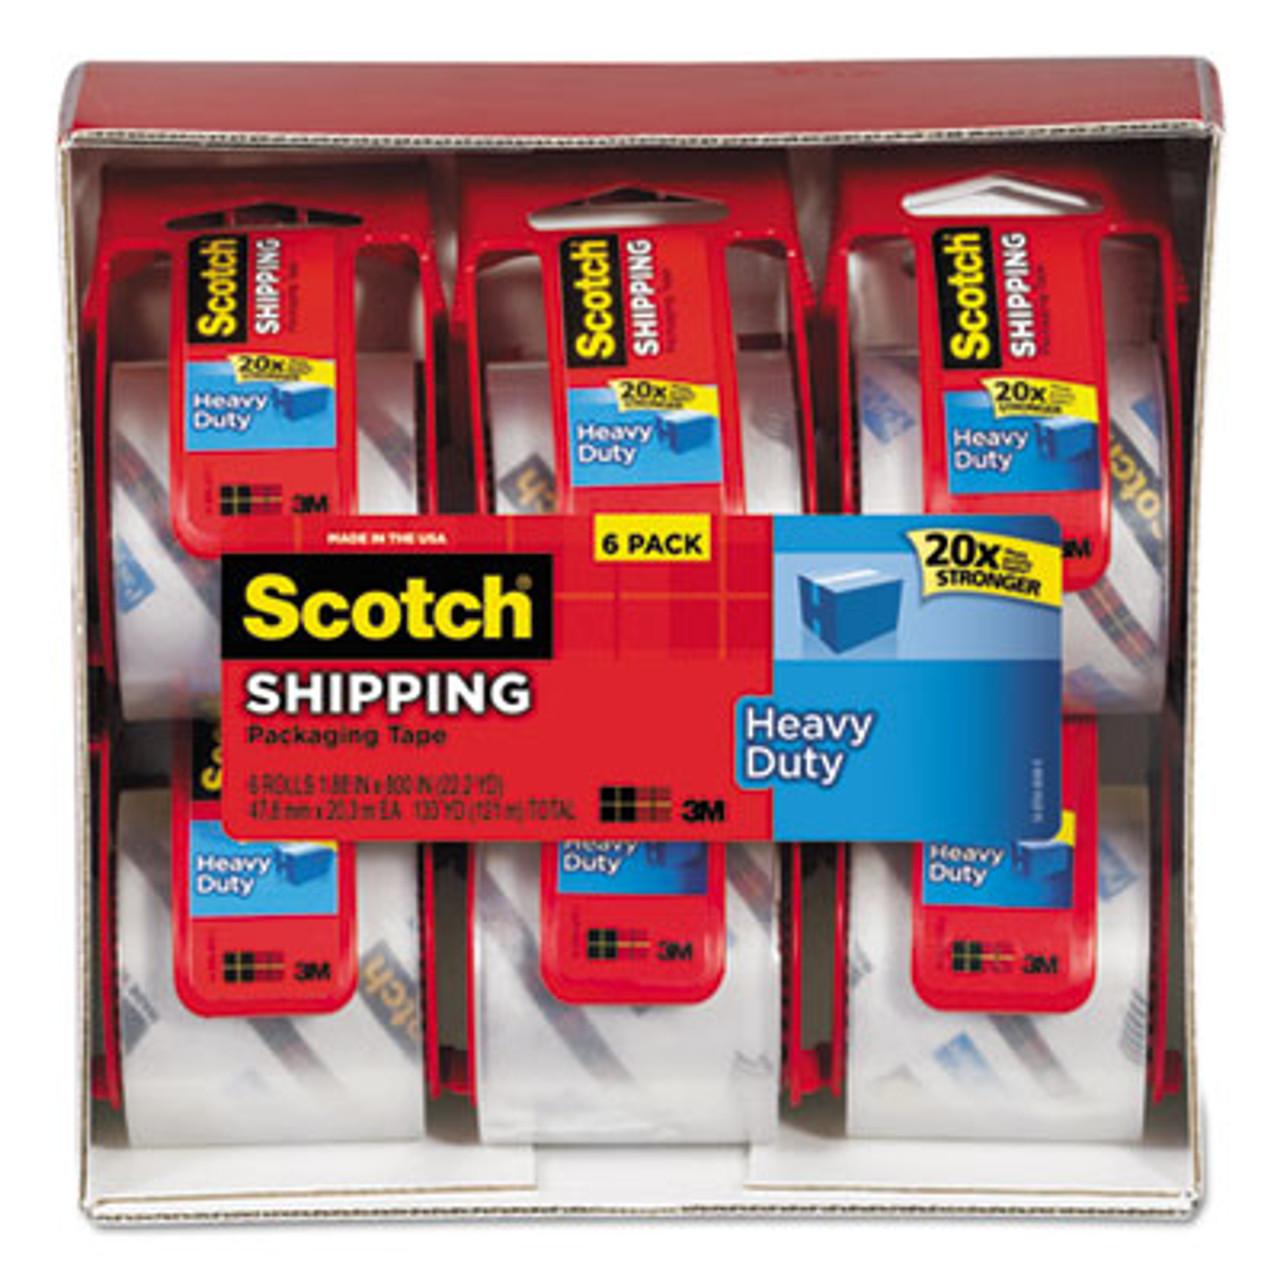 "3850 Heavy-Duty Packaging Tape in Sure Start Disp., 1.88"" x 22.2yds, 6/Pack"